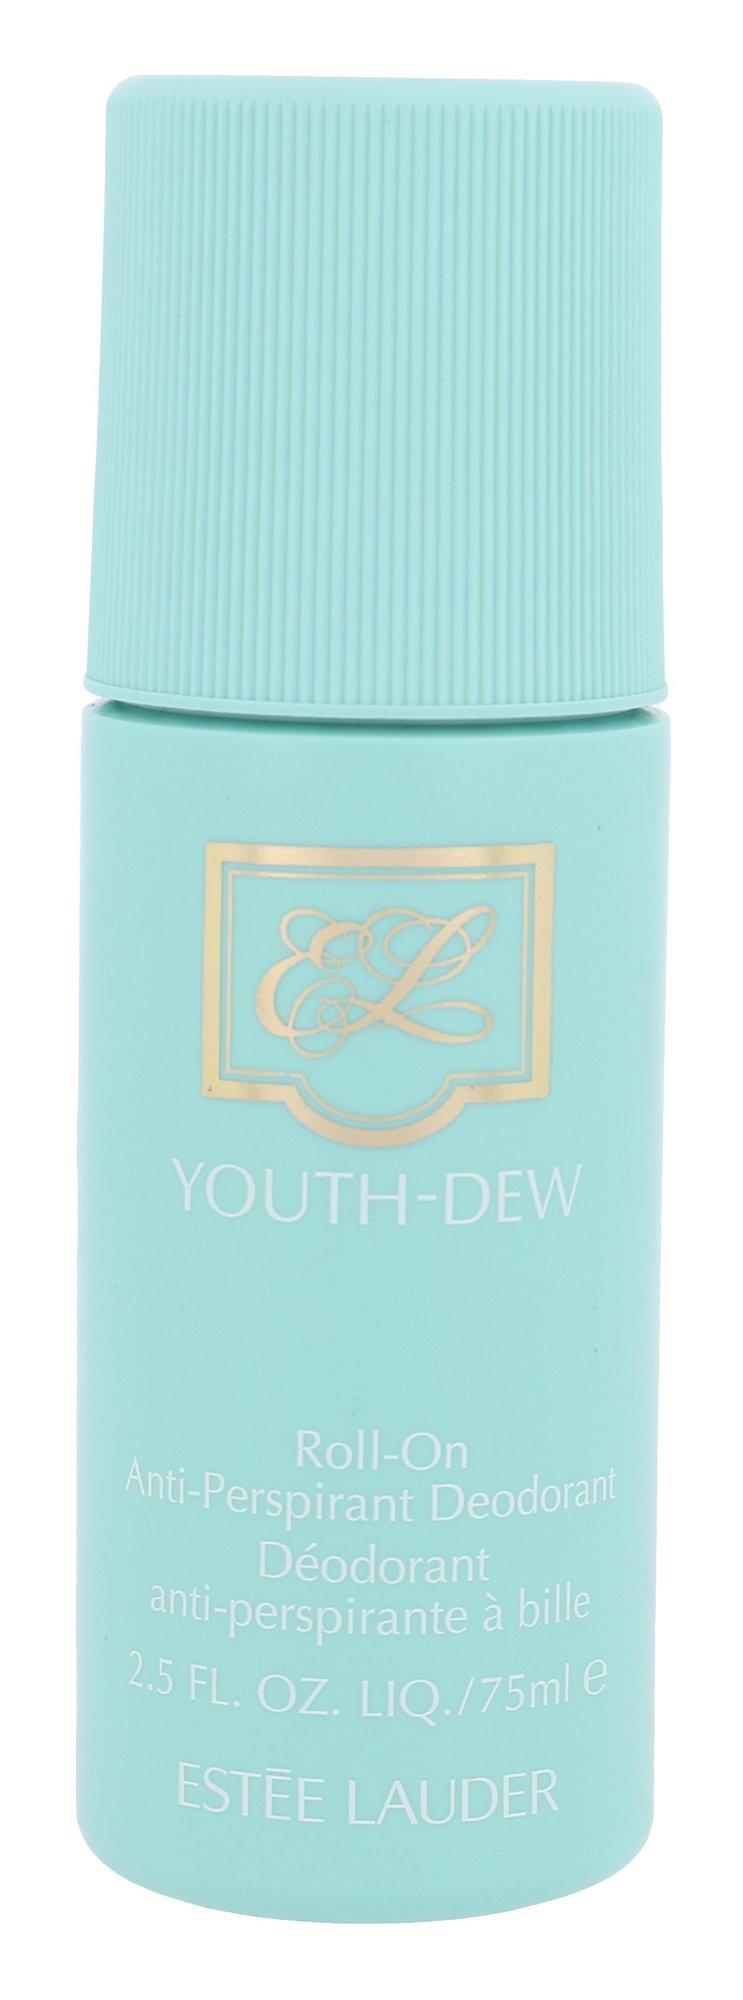 Estée Lauder Youth Dew Cosmetic 75ml